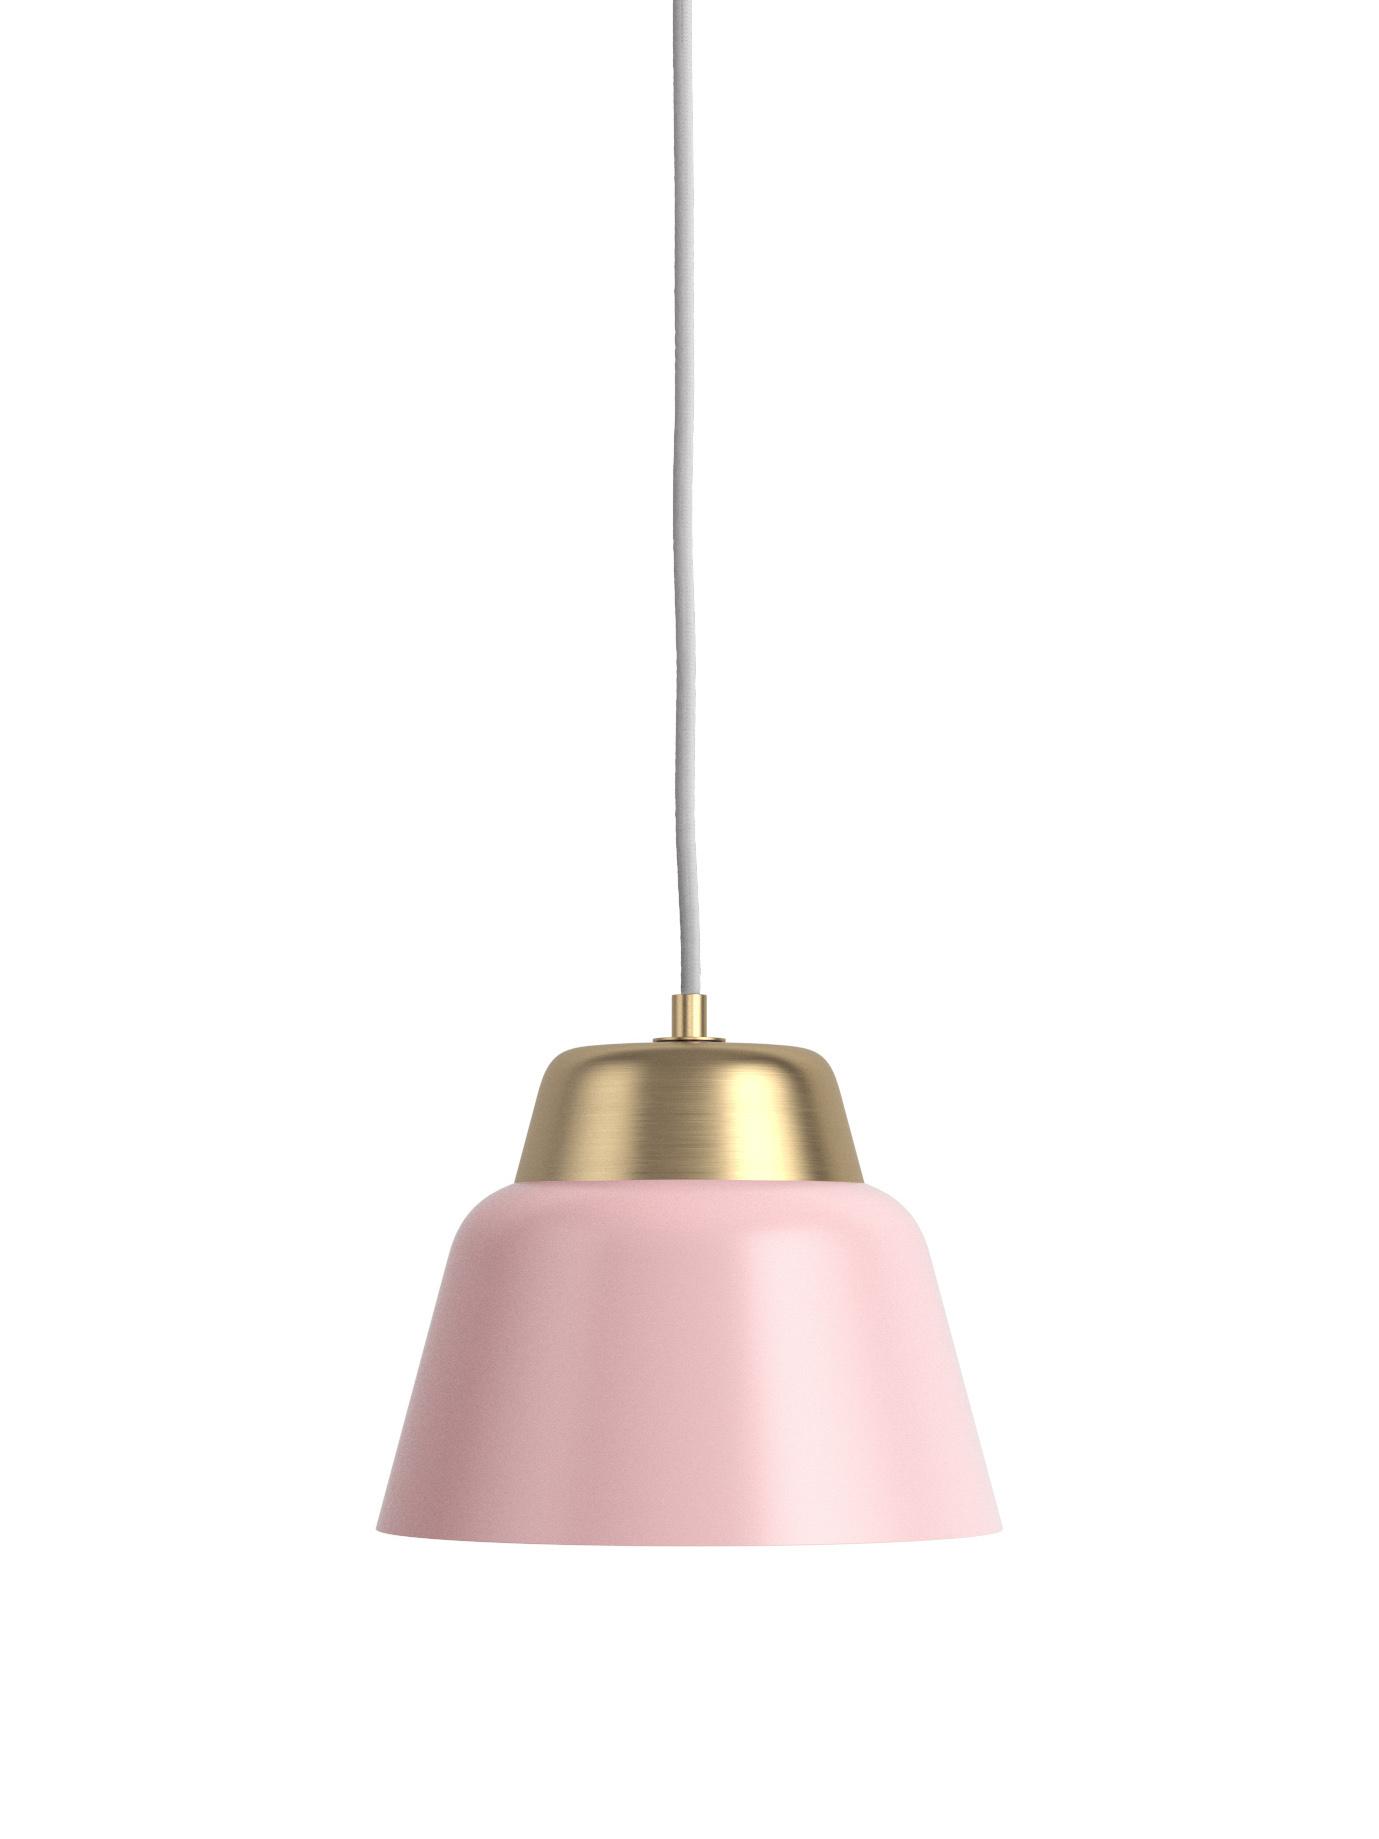 Modu S Pendant Light Br Pink Teo